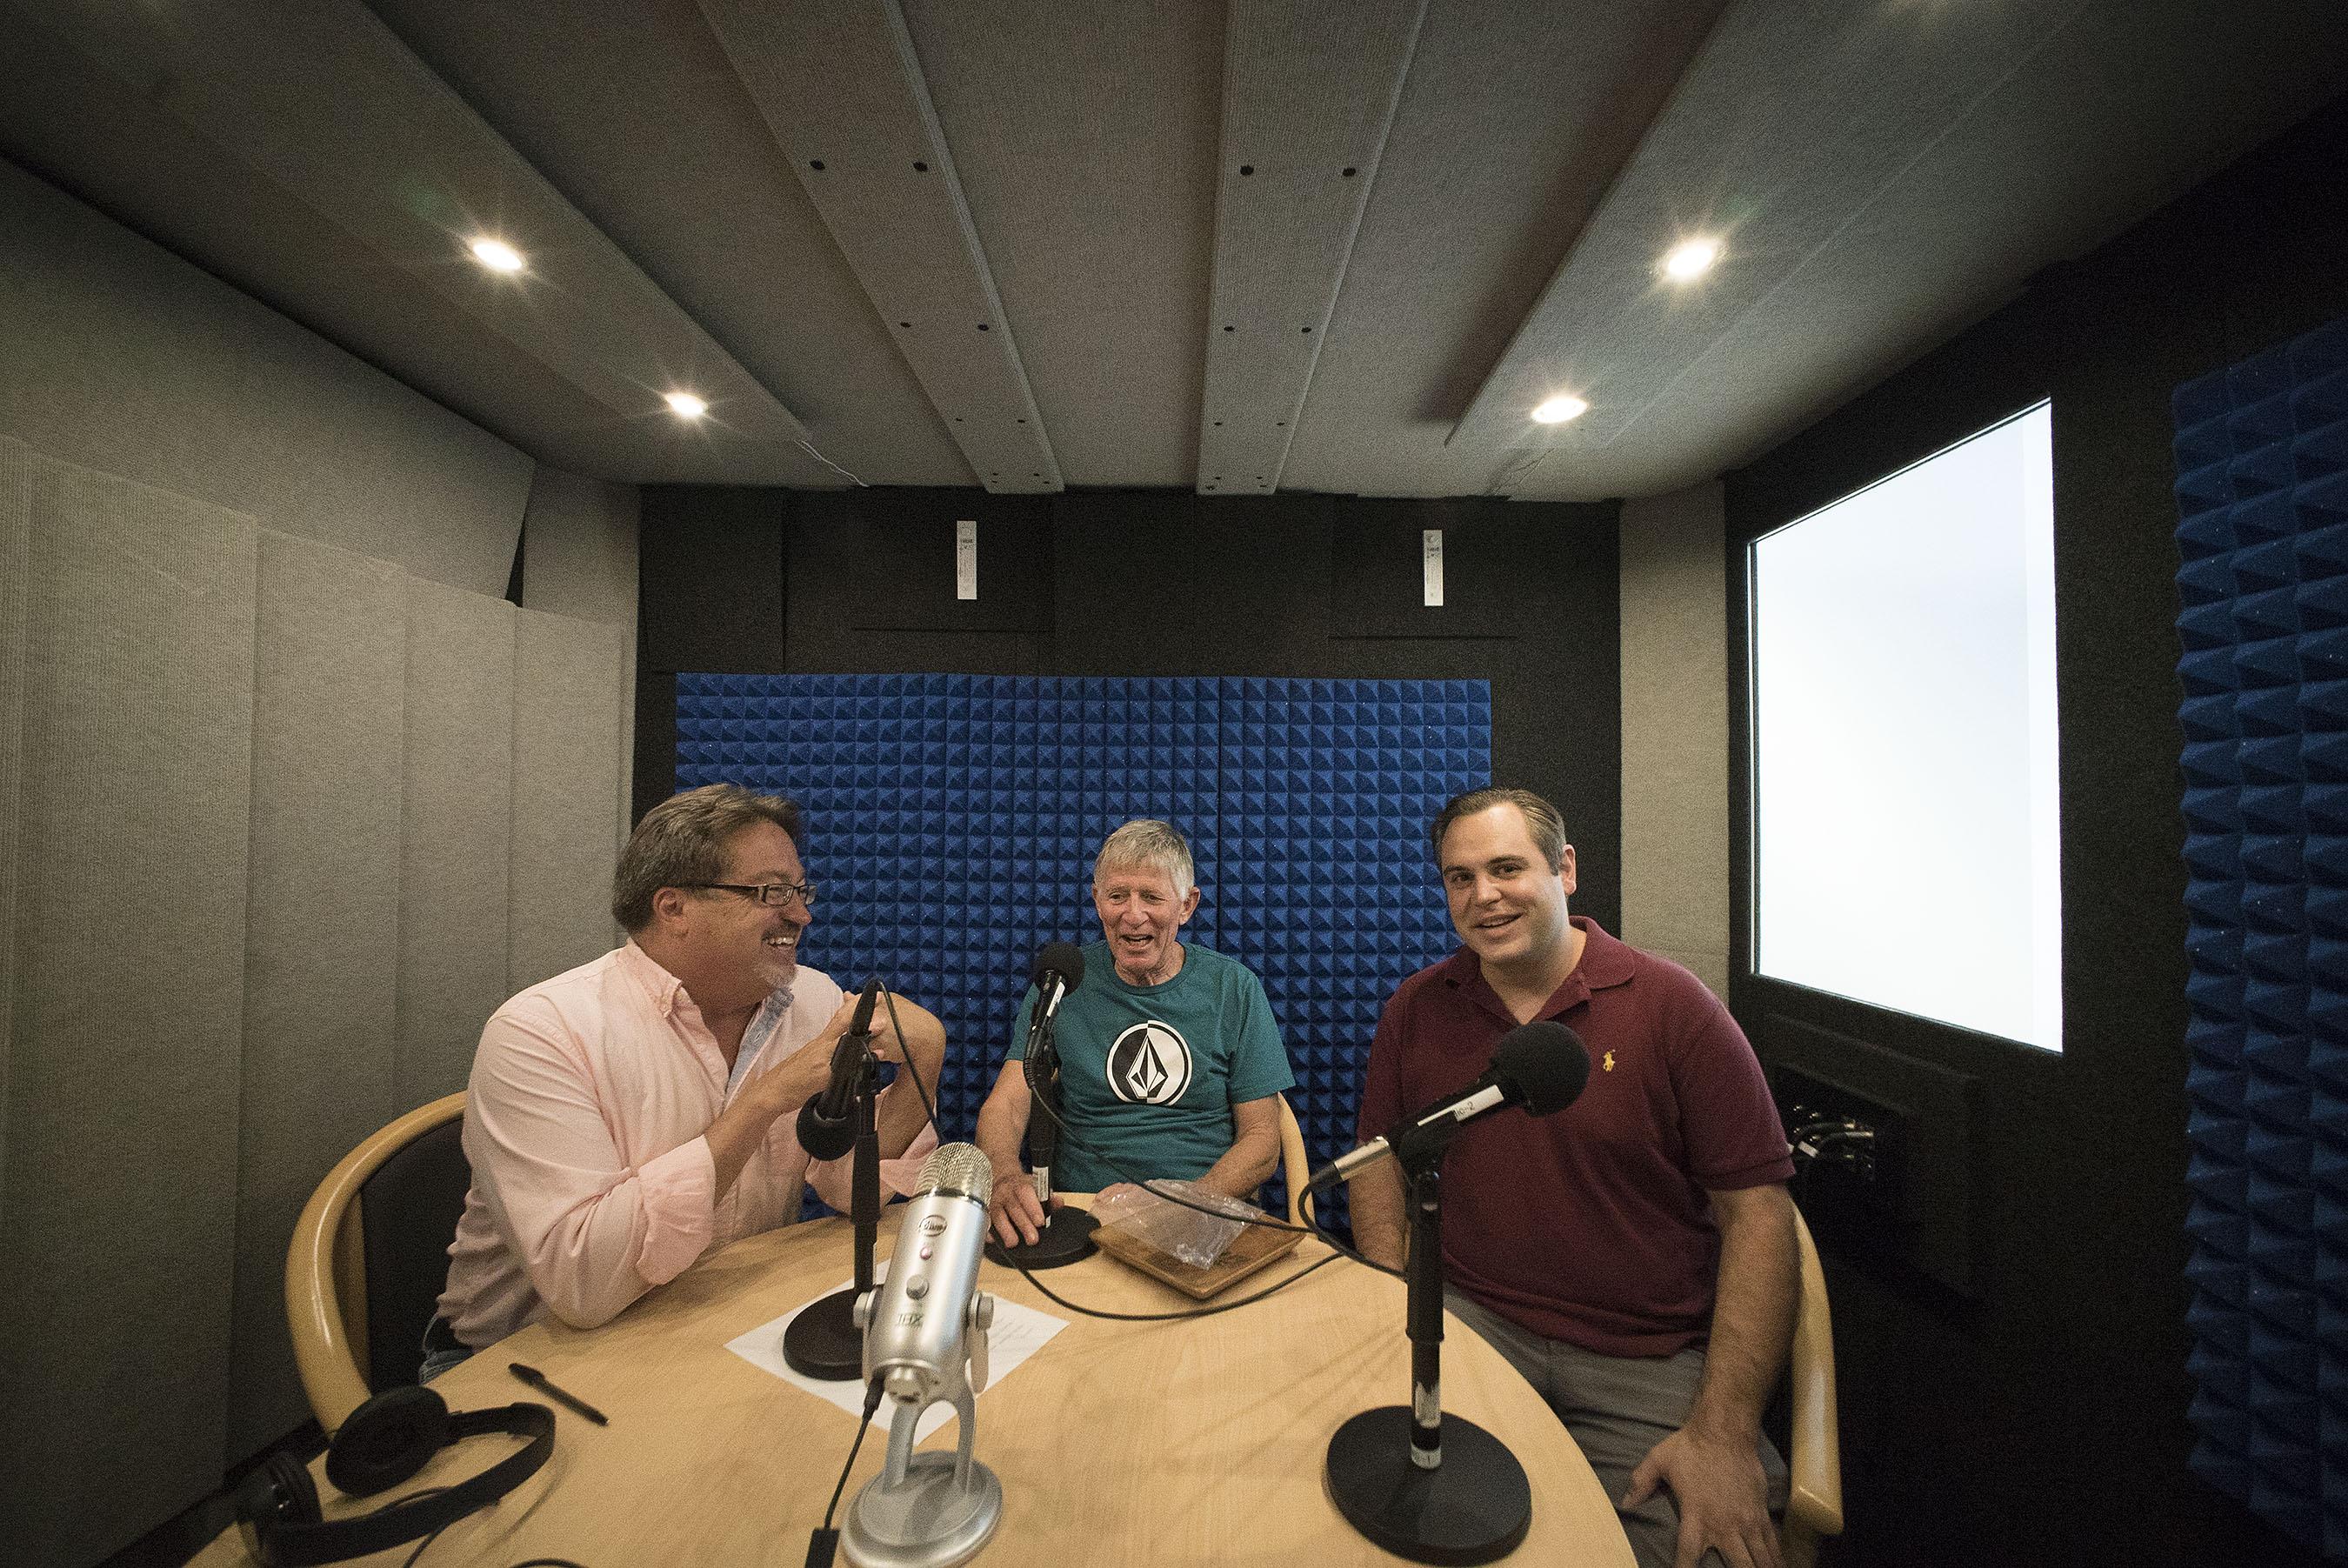 Podcast Blair Milner1. 30 june 2016